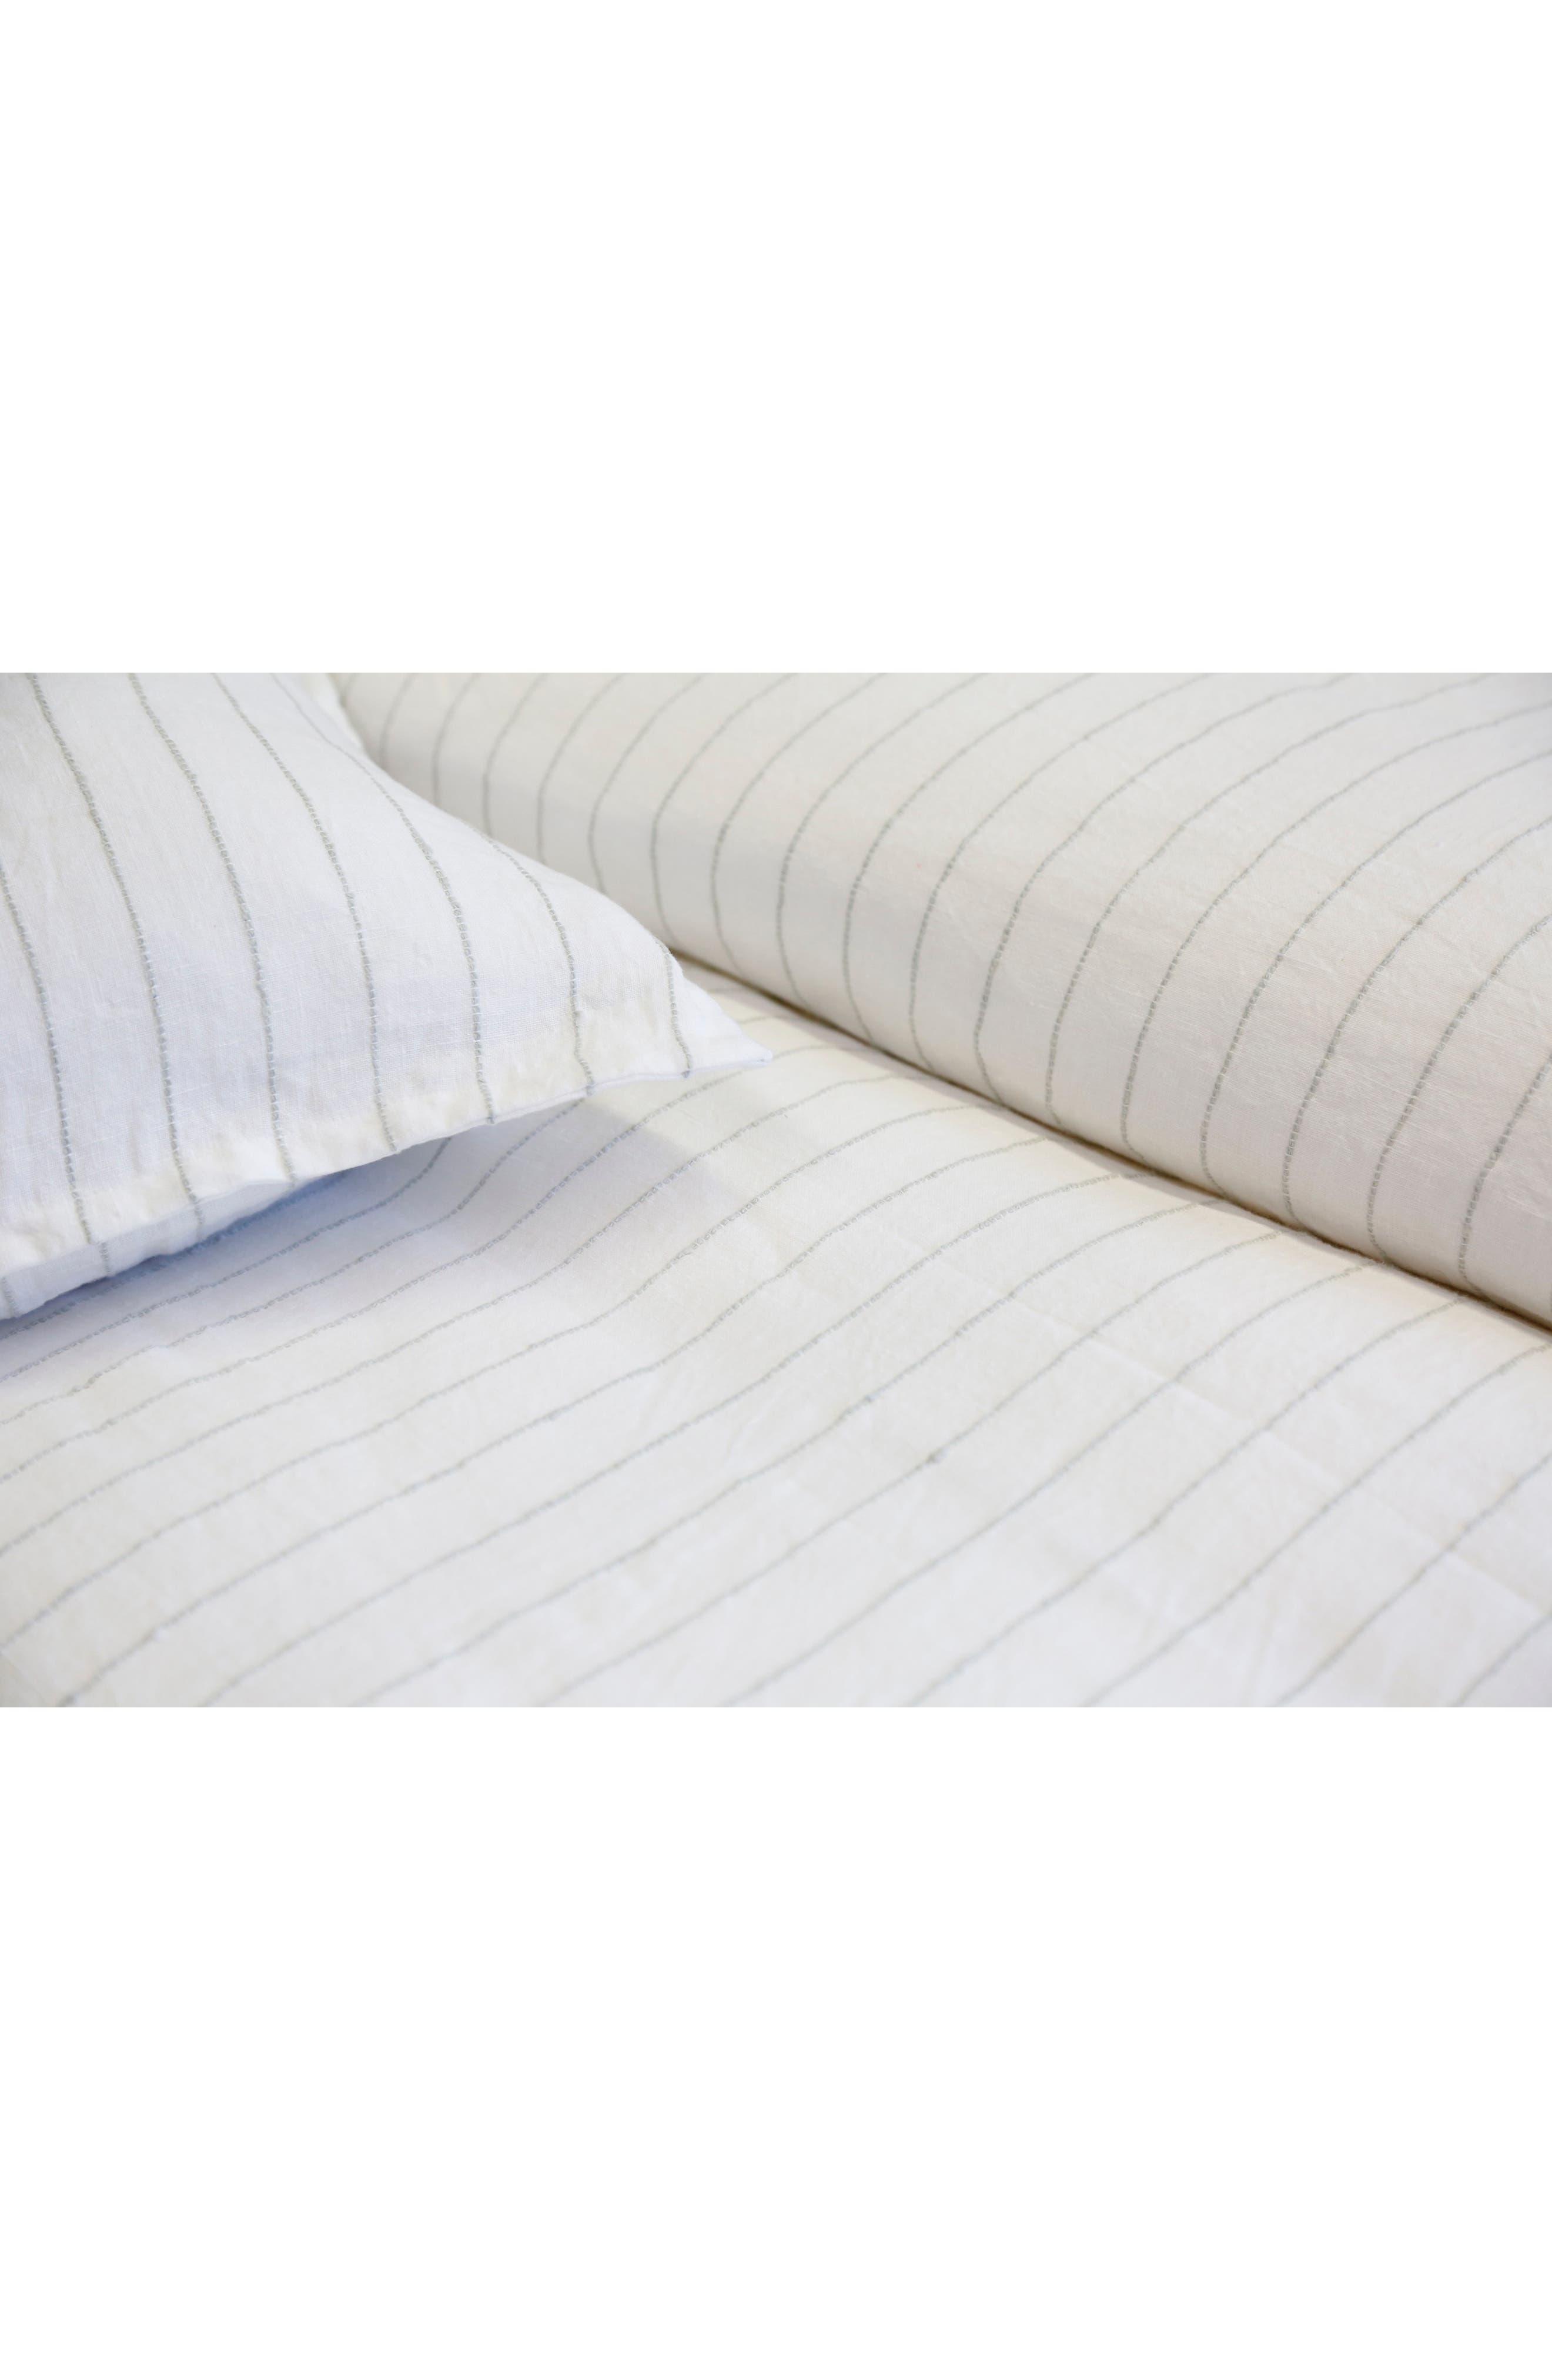 Blake Big Linen Accent Pillow,                             Alternate thumbnail 2, color,                             WHITE/ OCEAN